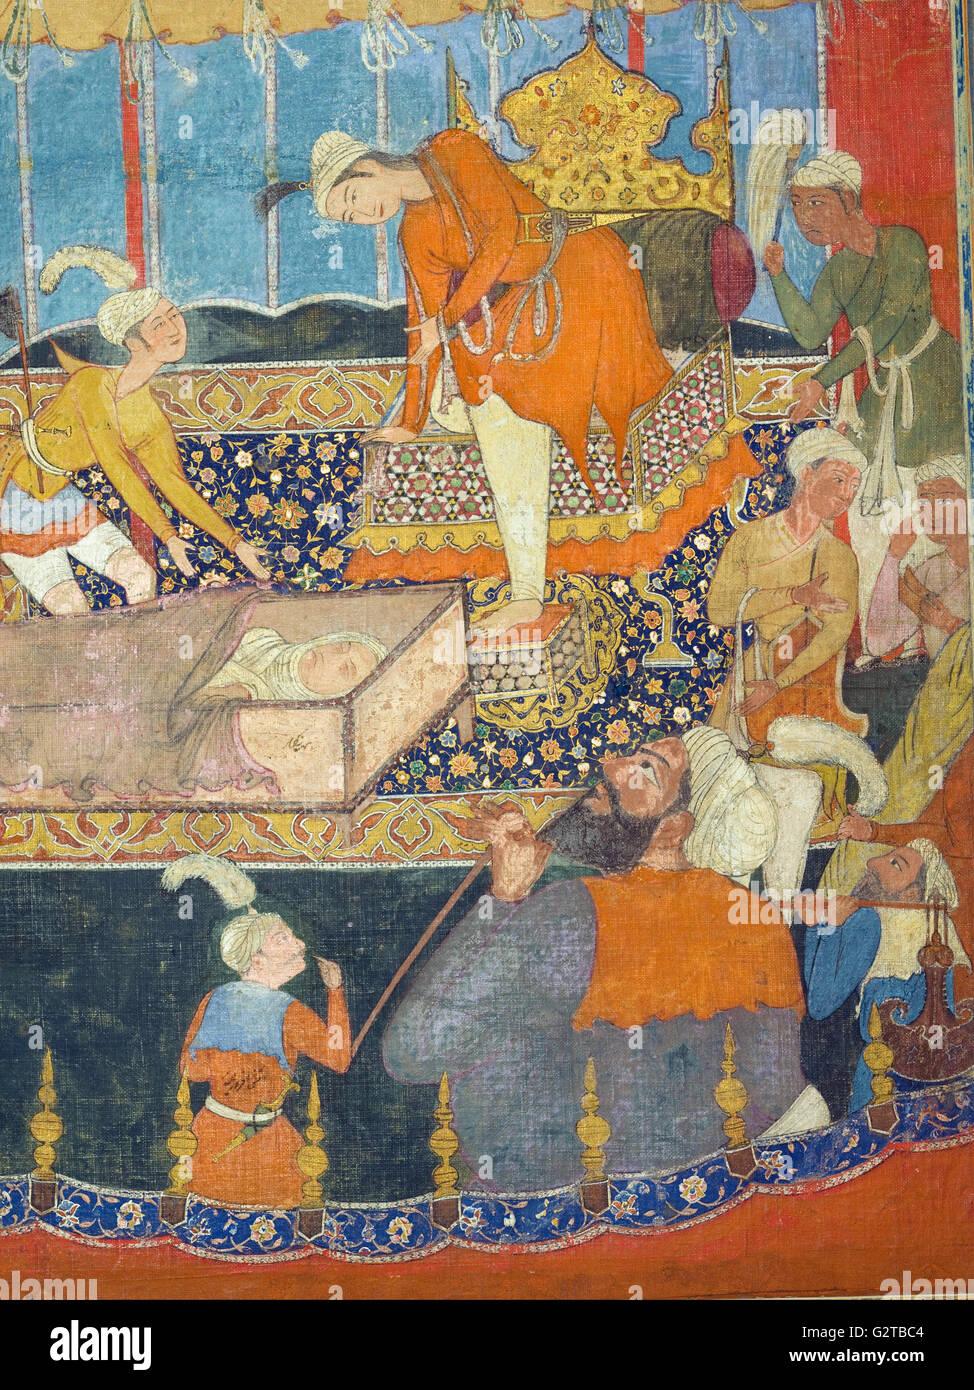 Unbekannt, Indien, 16. Jahrhundert - Illustration von Qissa-i Amir Hamza- Stockbild